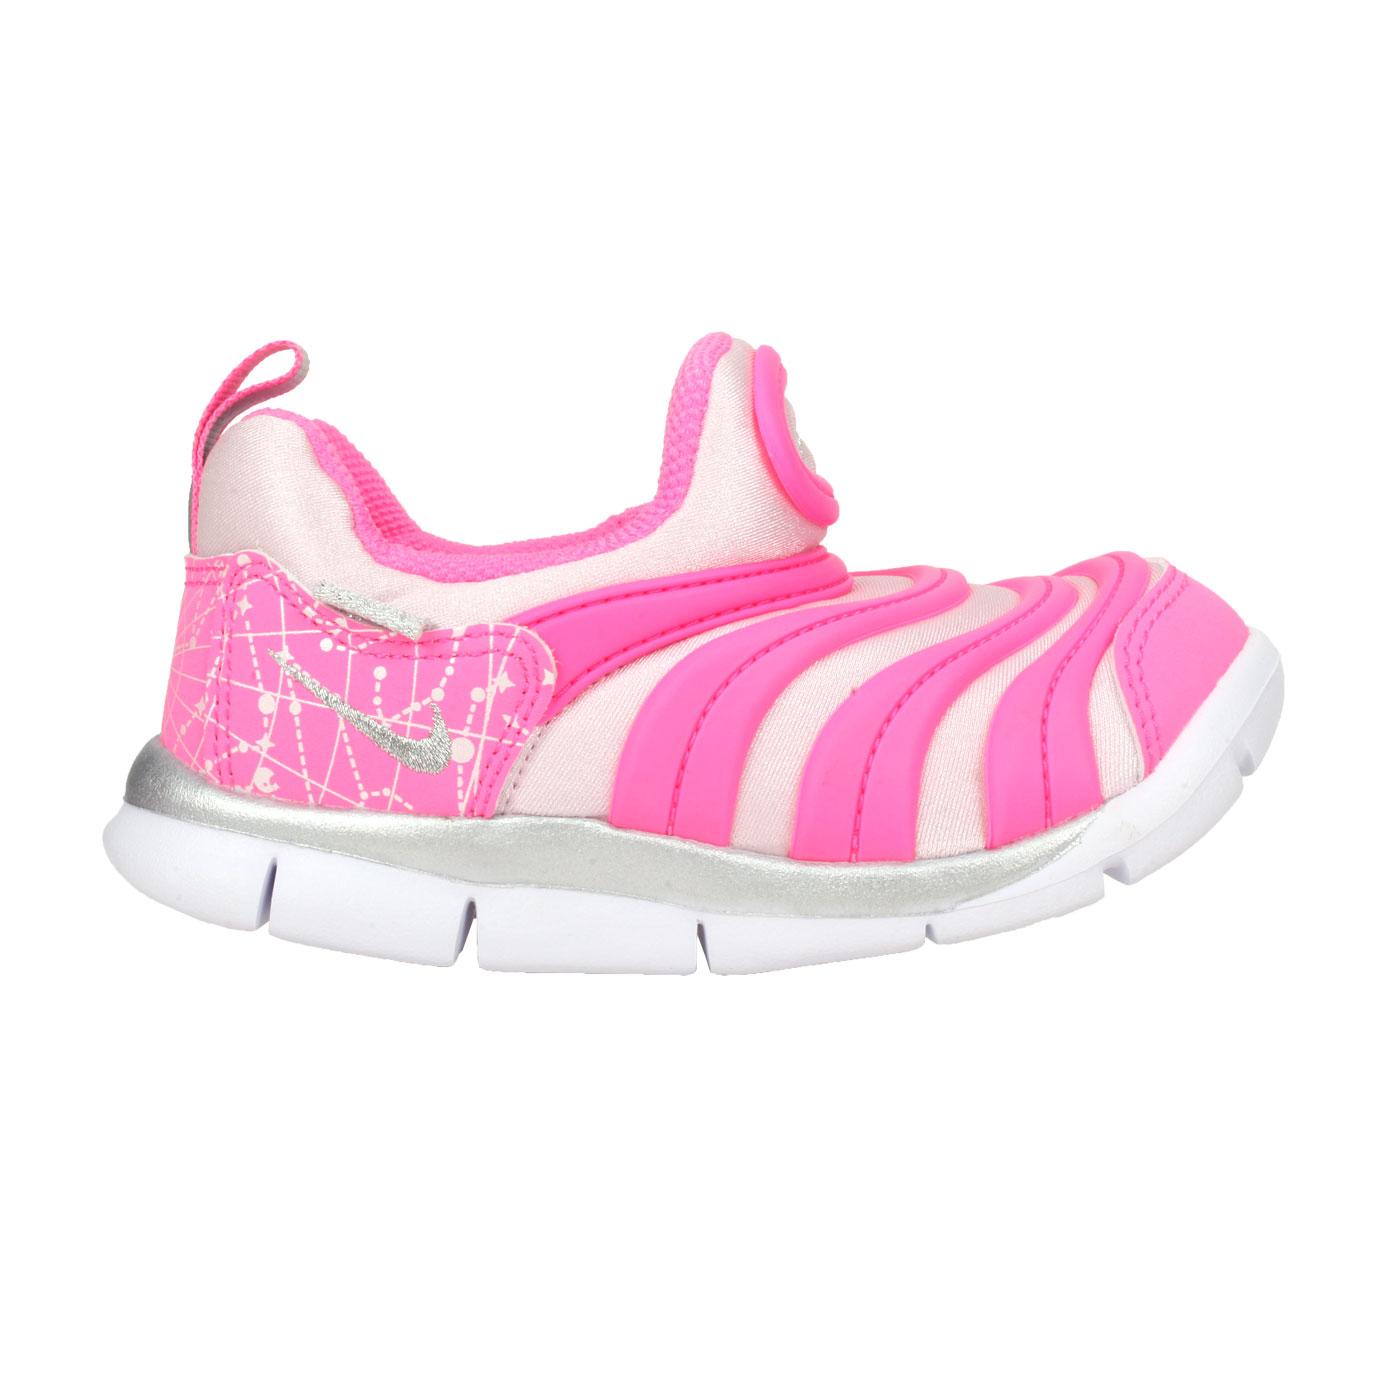 NIKE 小童休閒運動鞋  @DYNAMO FREE (TD)@DC3273606 - 粉紅銀